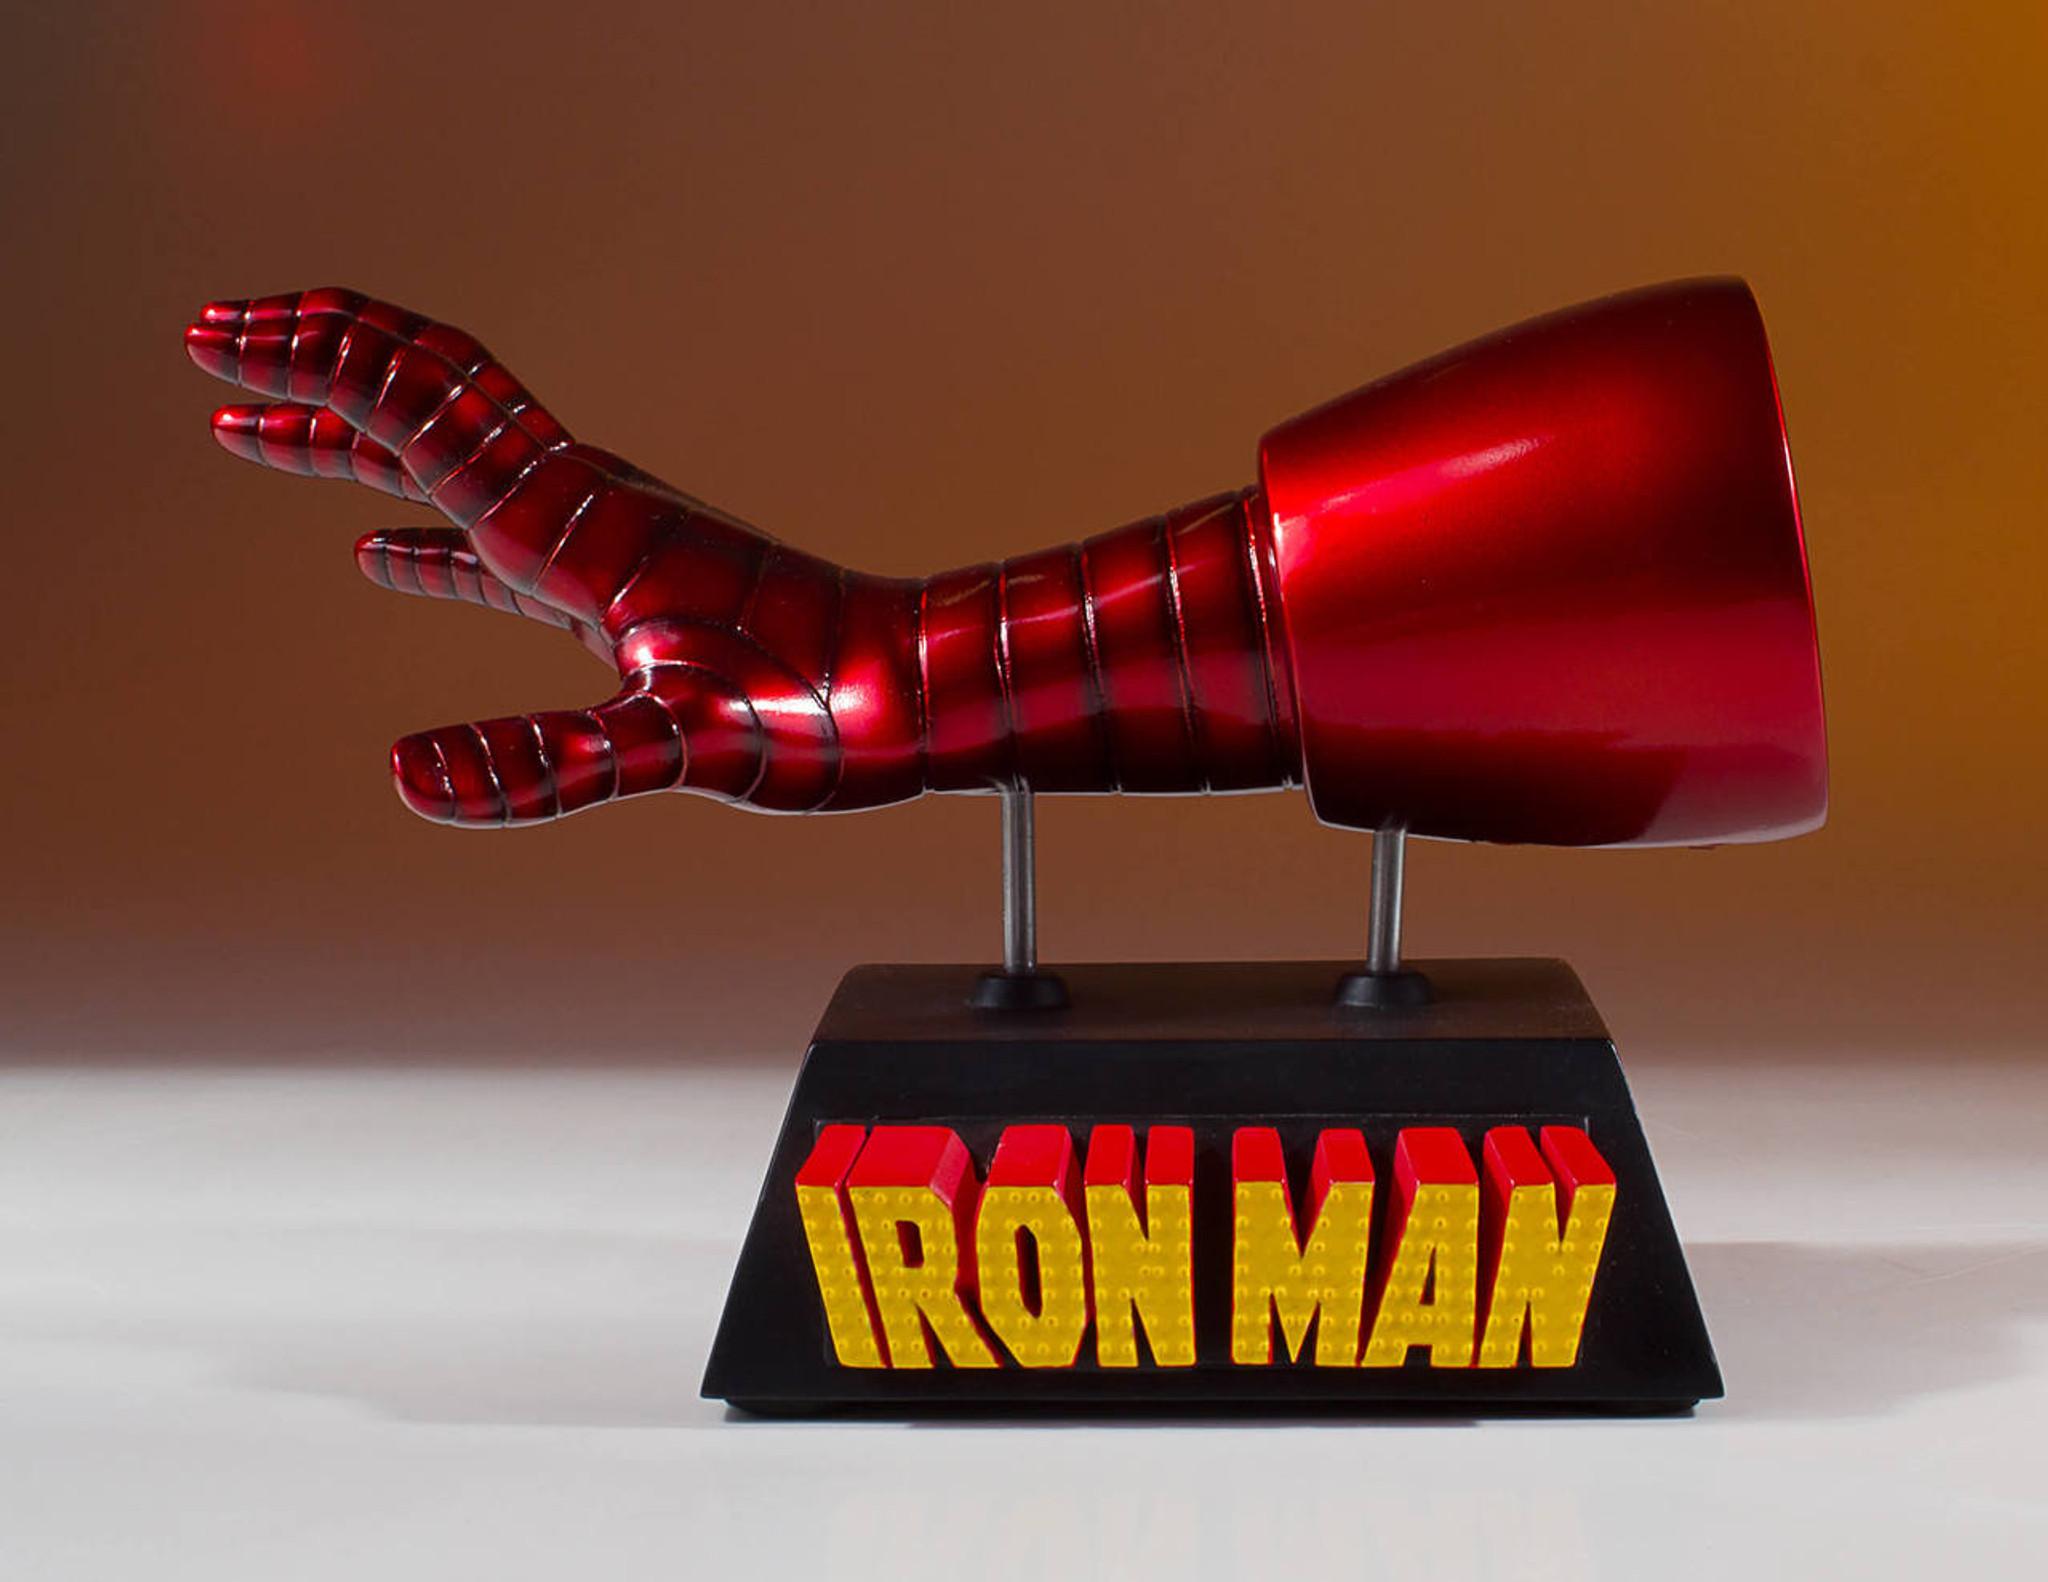 Iron Man Business Card Holder Desk Accessory - Gentle Giant Ltd